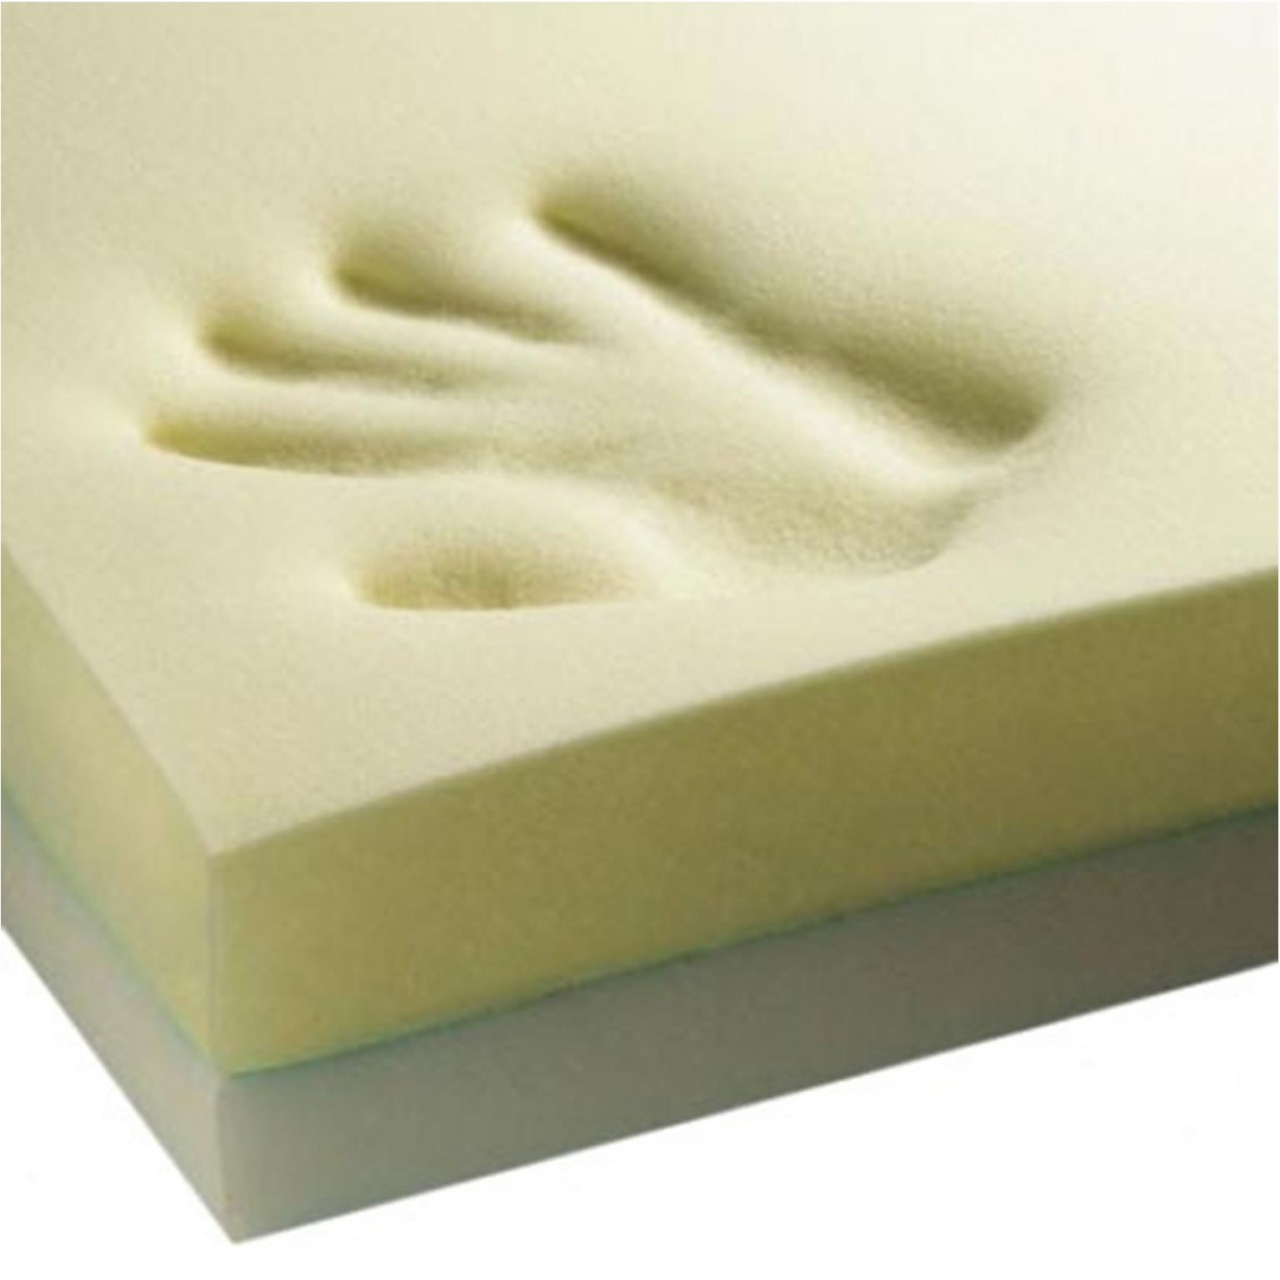 Nasa Mattress Topper Nasa Memory Foam Mattress Topper Home Decorations Idea Title Cheap And